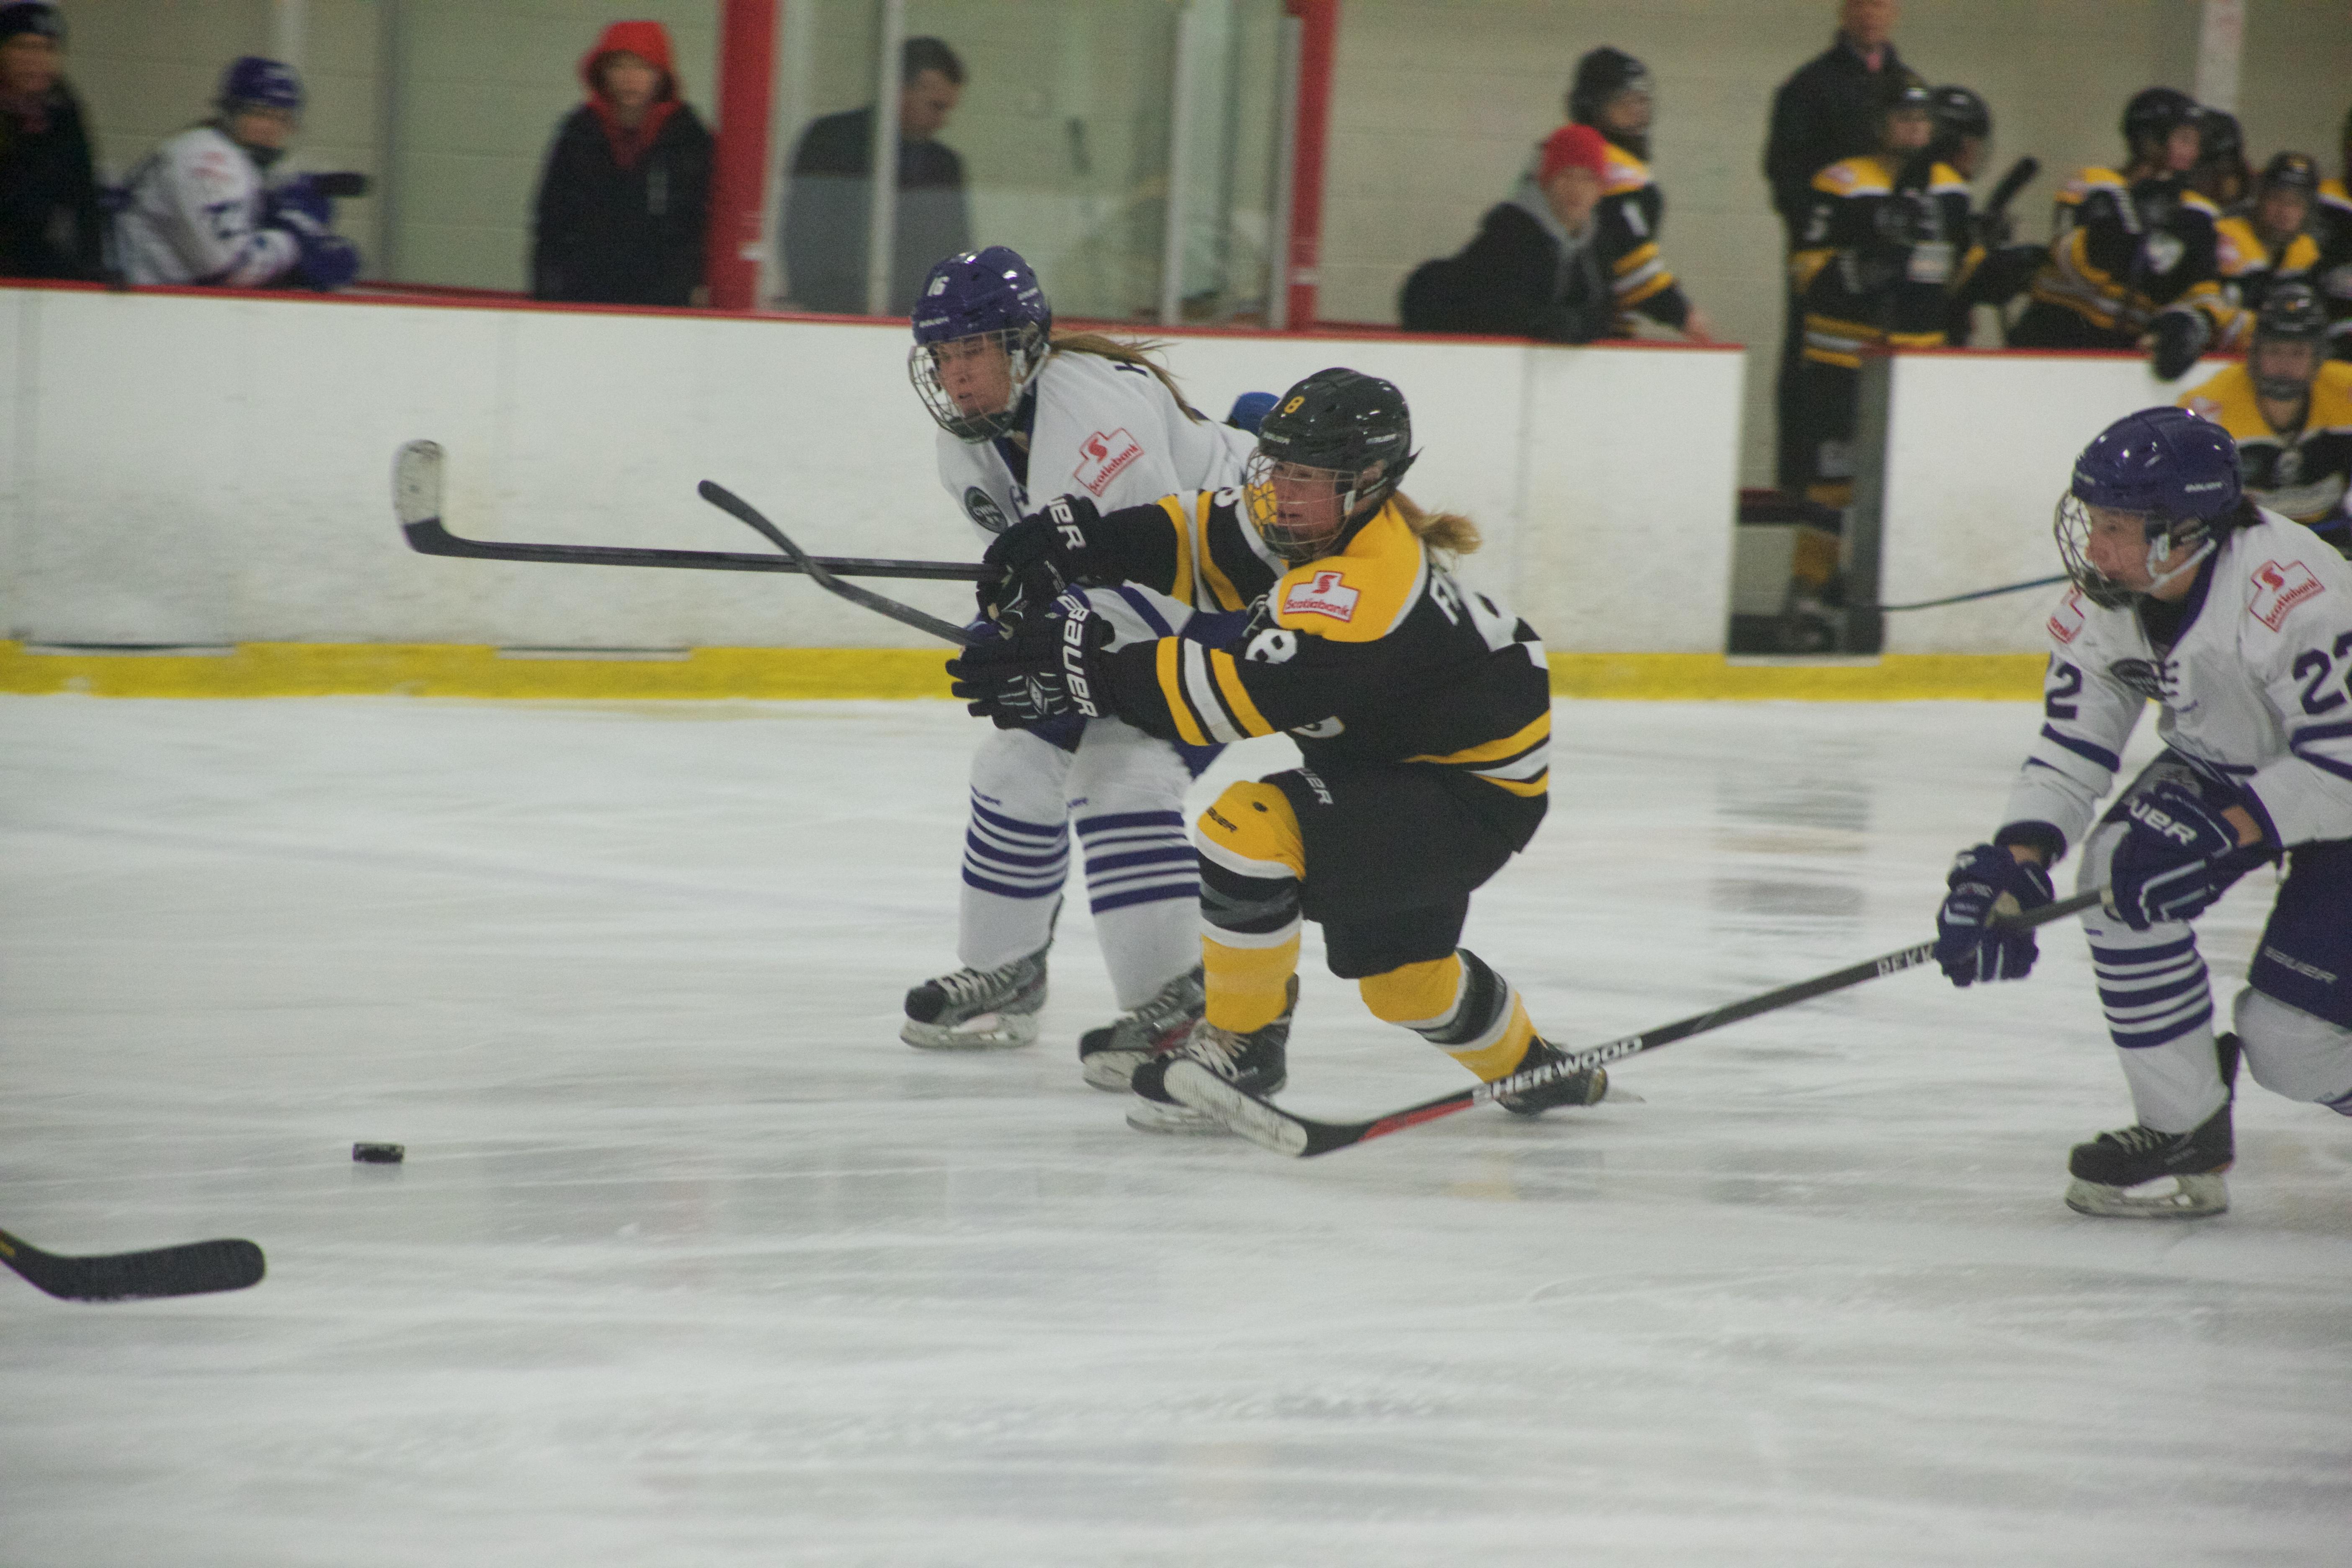 Boston Blades forward Rachel Farrel battles for the puck in Sunday's game.